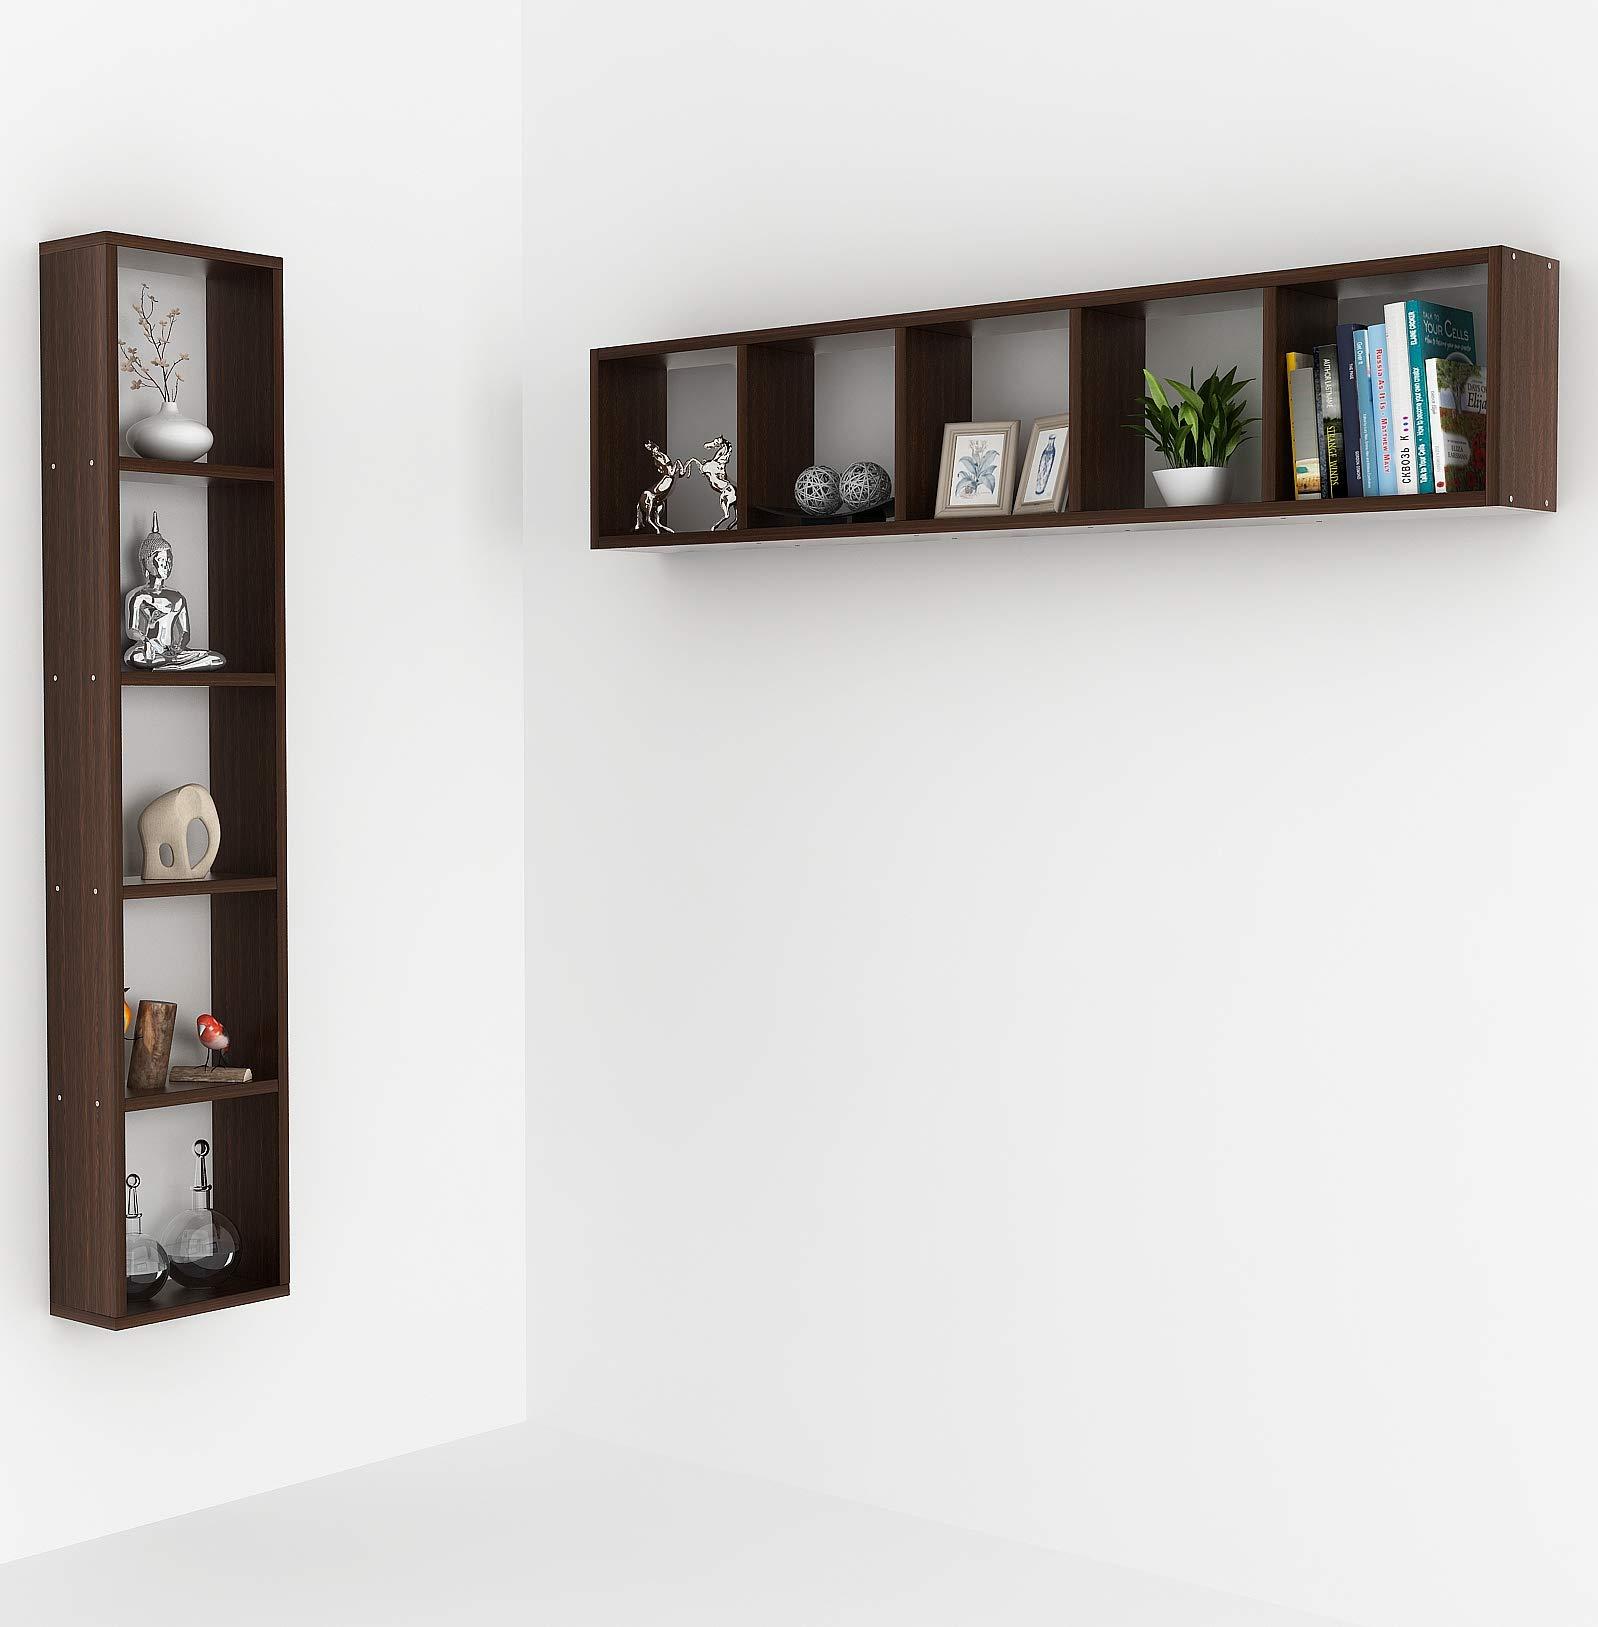 buy online 1cc06 db94d Bluewud Walten Wall Mount Book Shelf Rack/Display (Standard, Wenge)